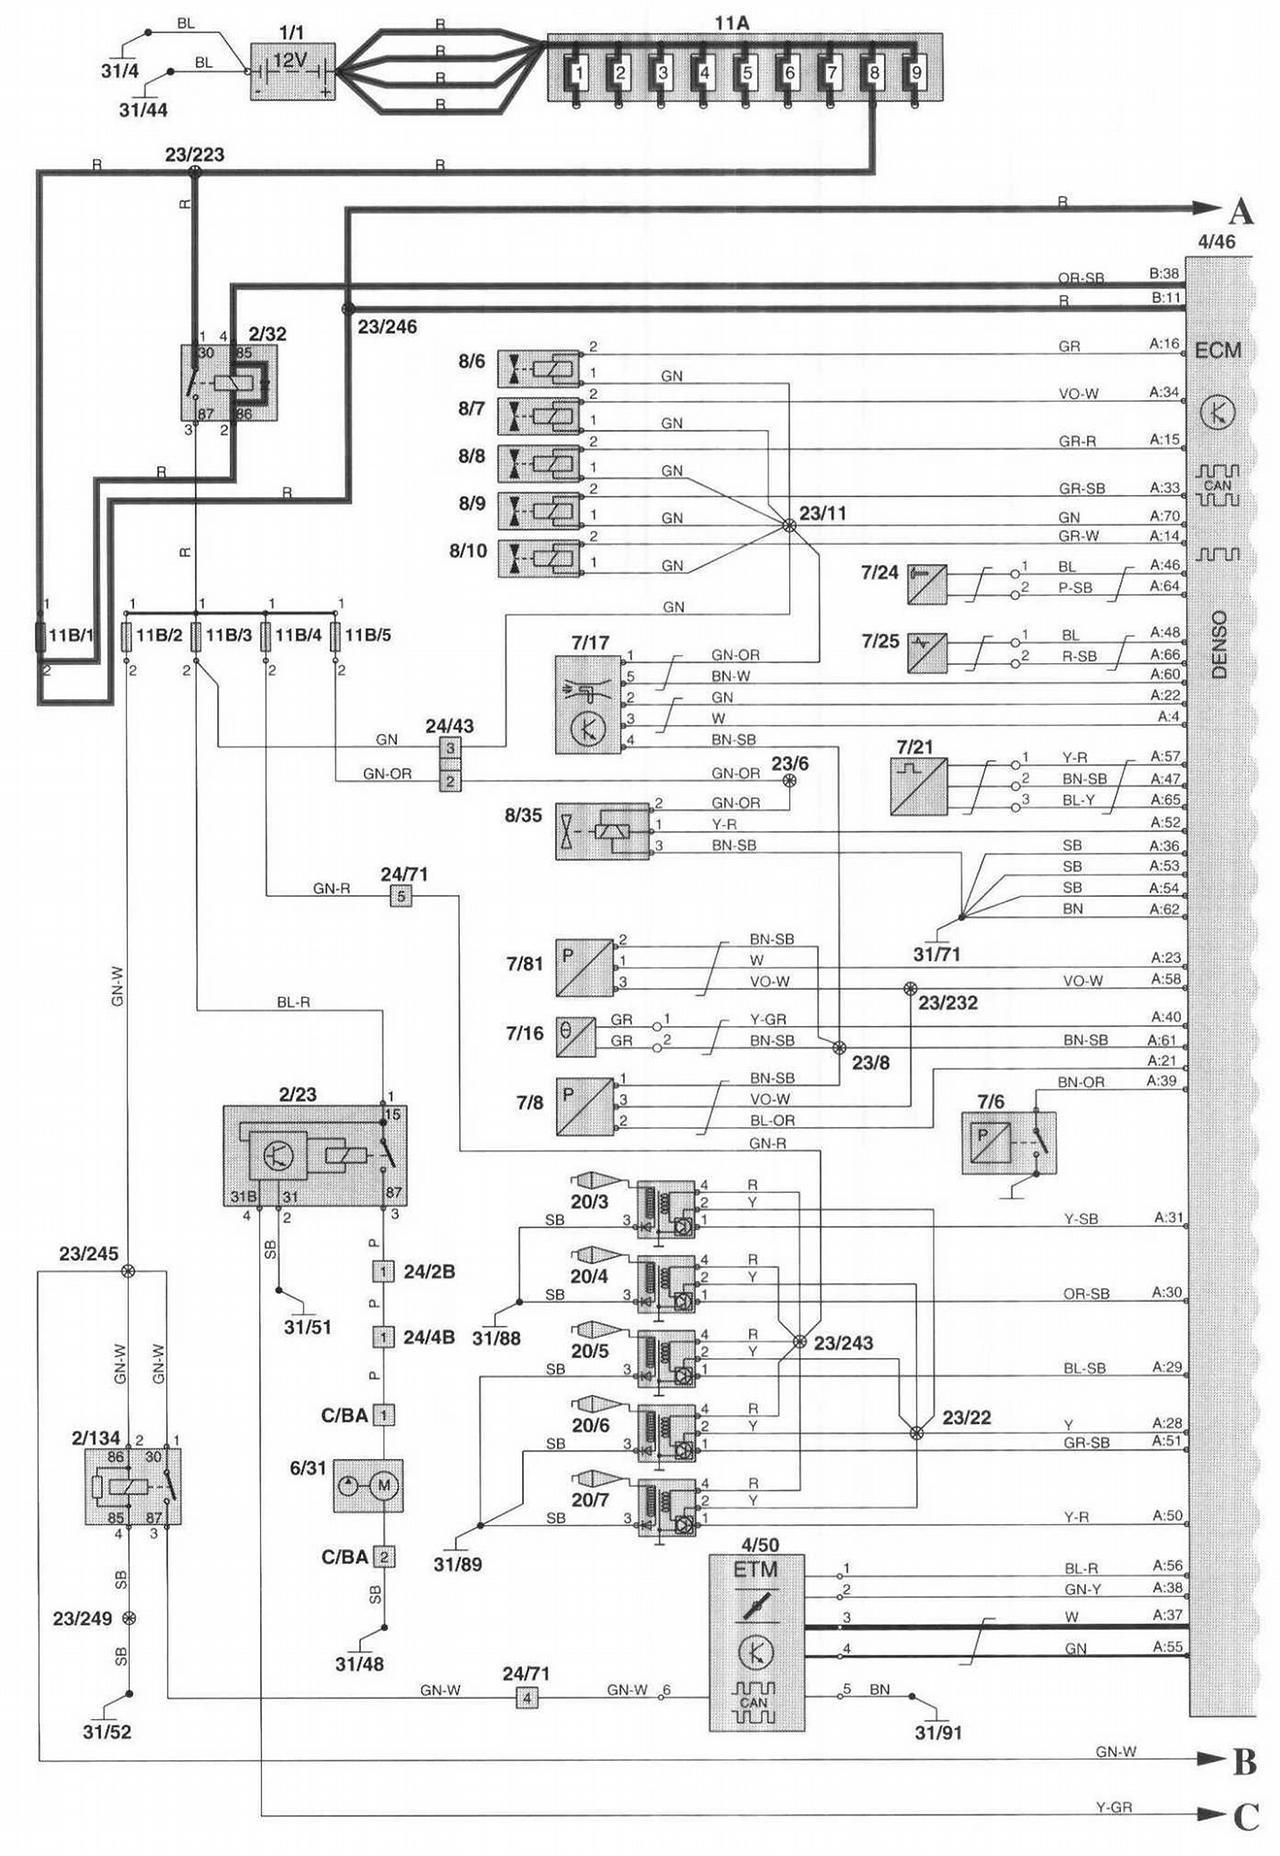 2010 Volvo Xc60 Wiring Diagram 4 Pin Trailer Wiring Diagram Light Jeepe Jimny Pujaan Hati Jeanjaures37 Fr